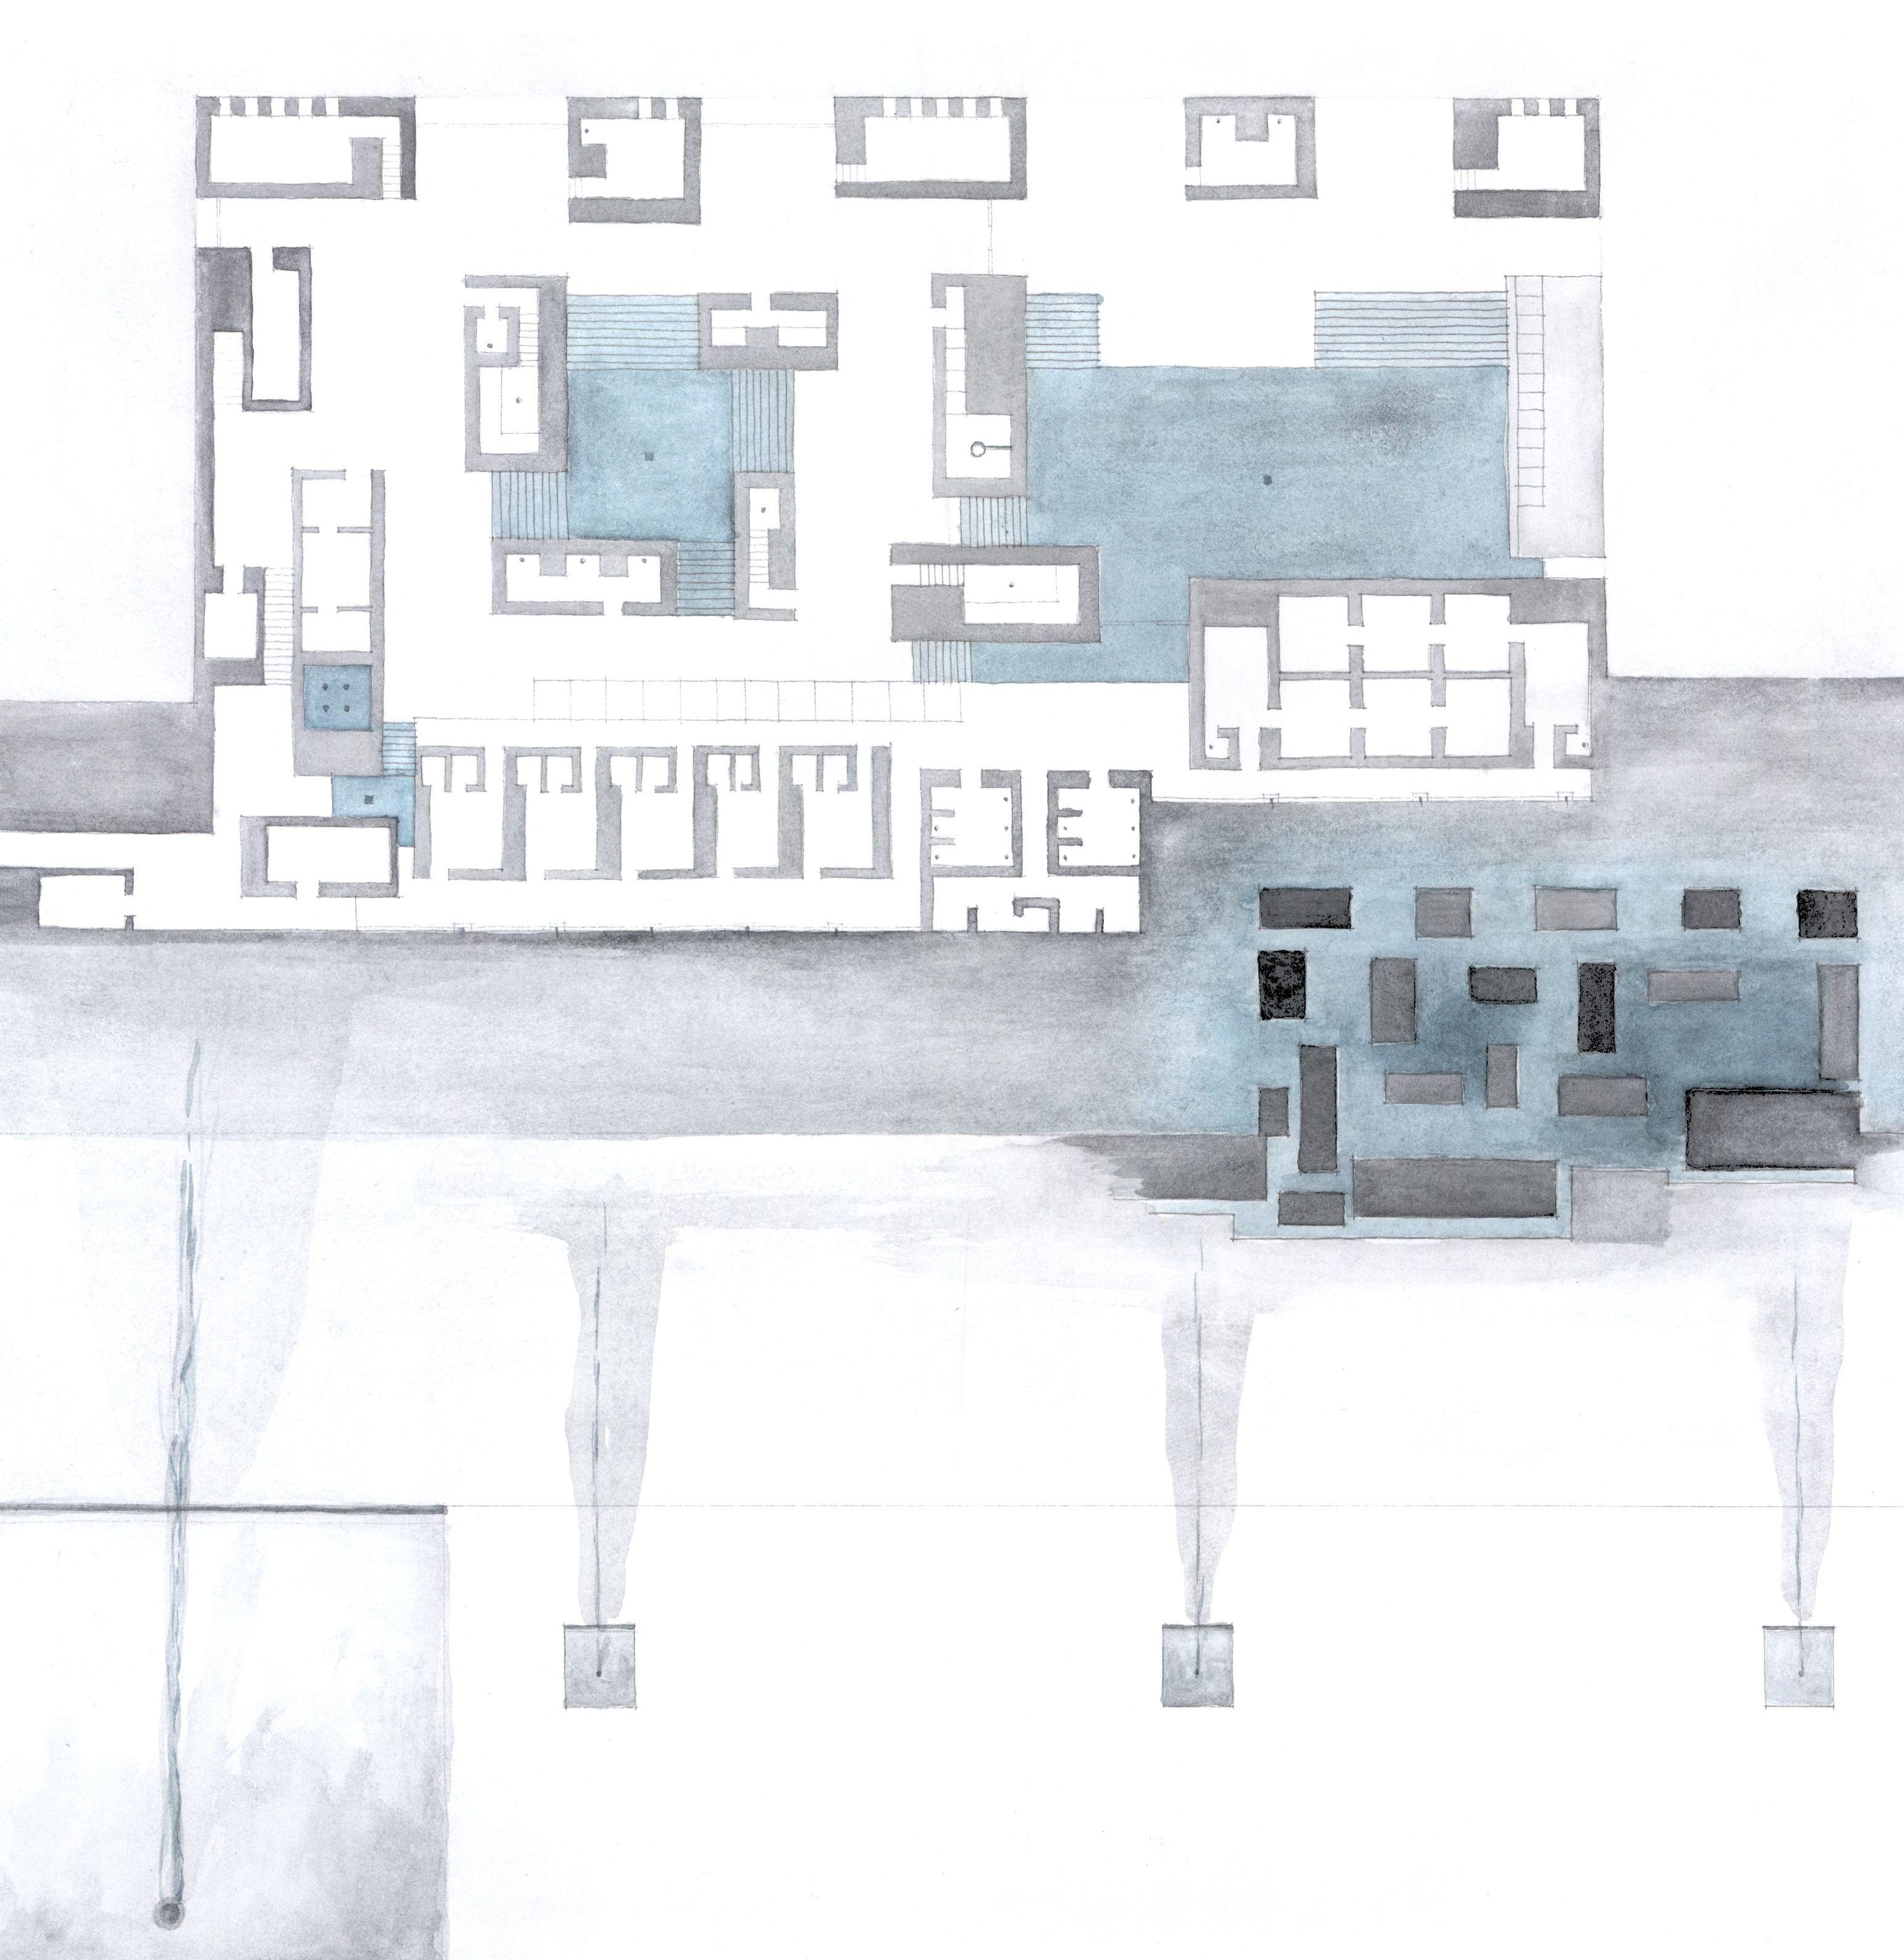 thermal vals peter zumthor architecture. Black Bedroom Furniture Sets. Home Design Ideas